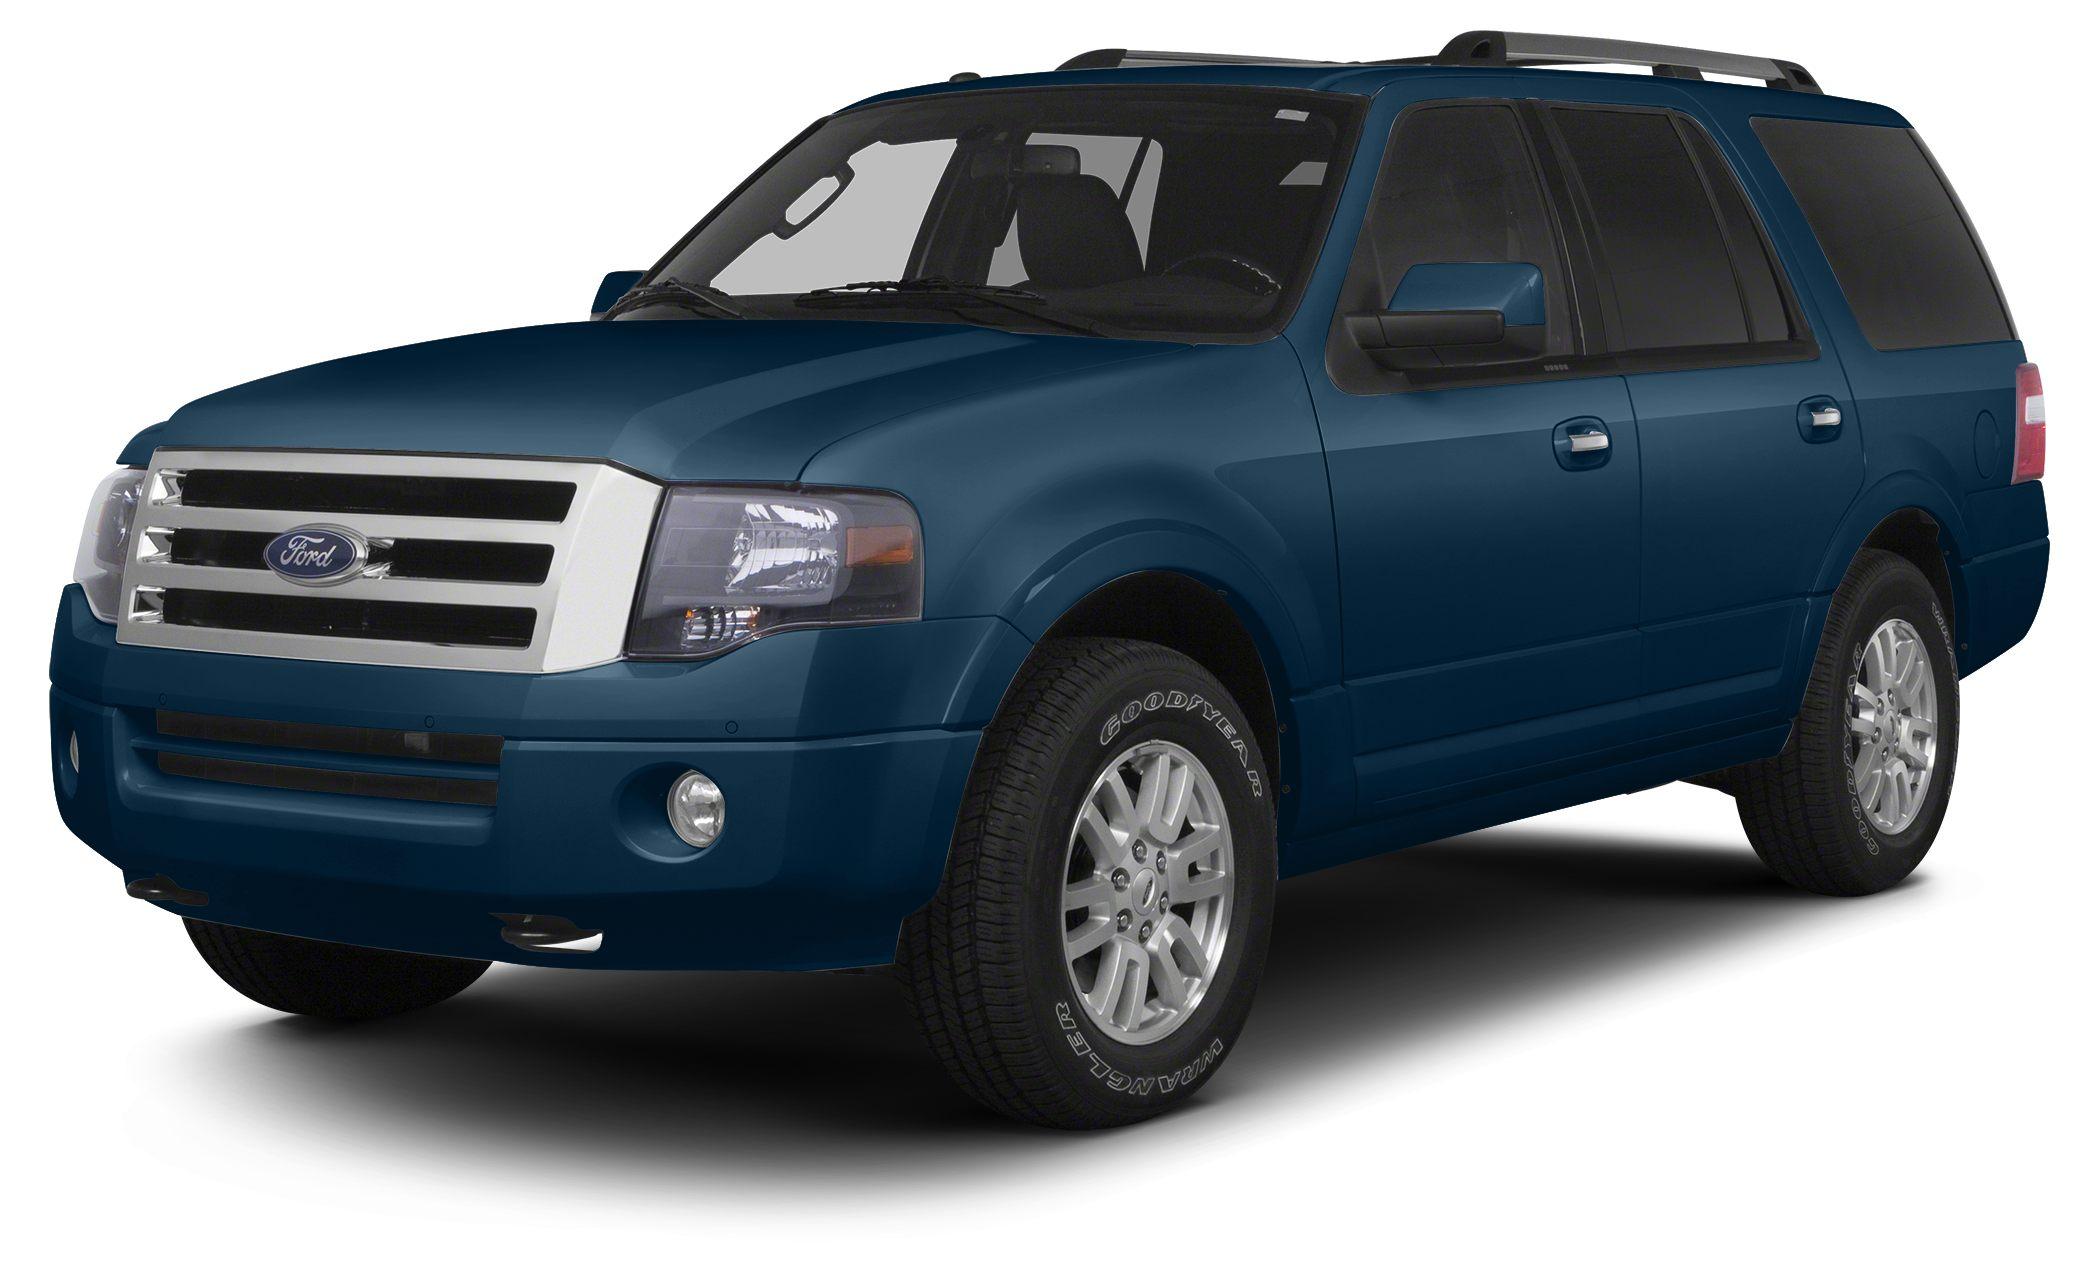 2013 Ford Expedition XLT Miles 43607Color Blue Stock DEF45166 VIN 1FMJU1H52DEF45166